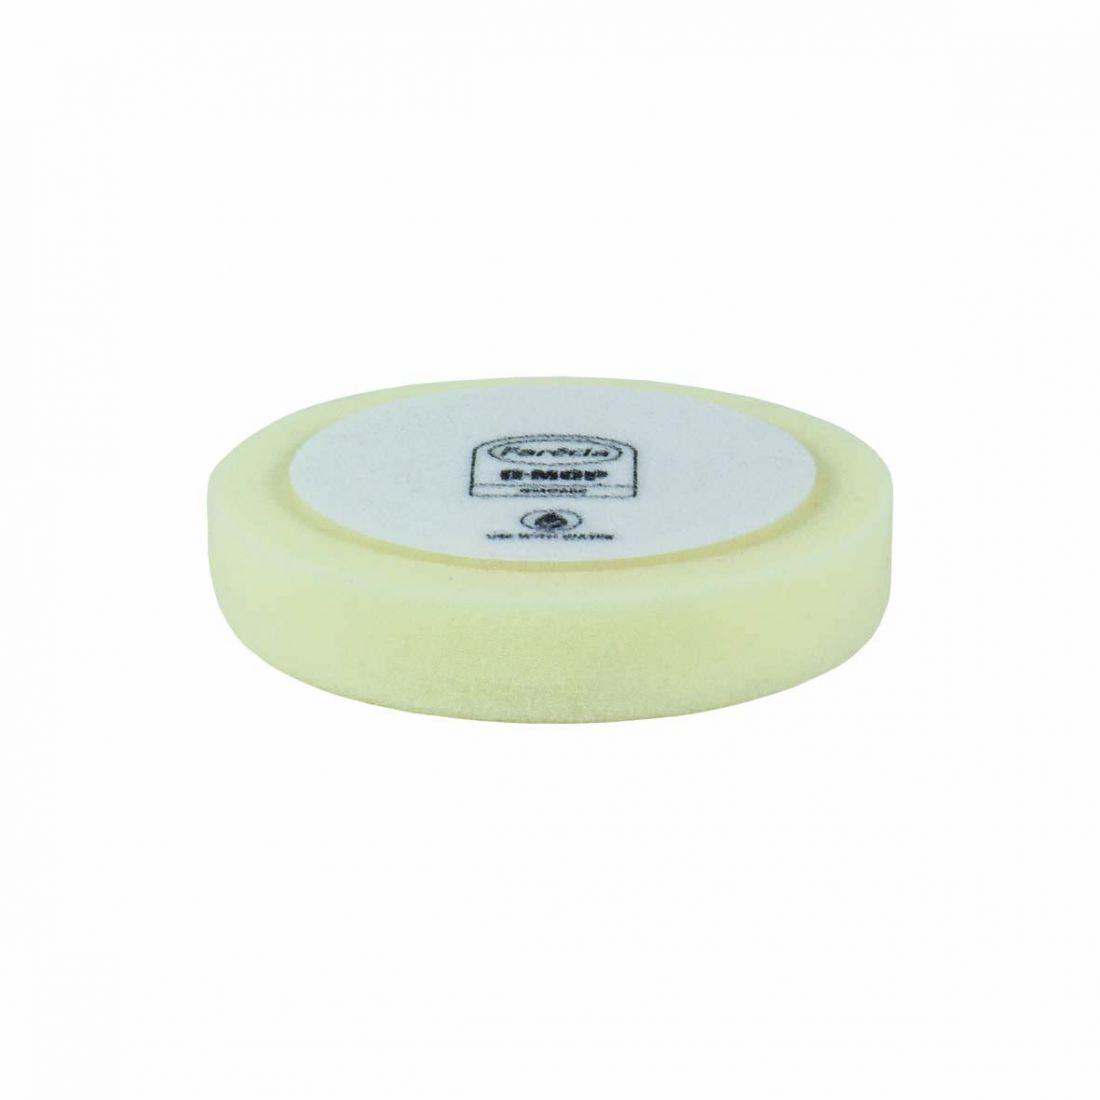 "FARECLA G Mop 6"" Wet Use Compounding Foam, 150мм"